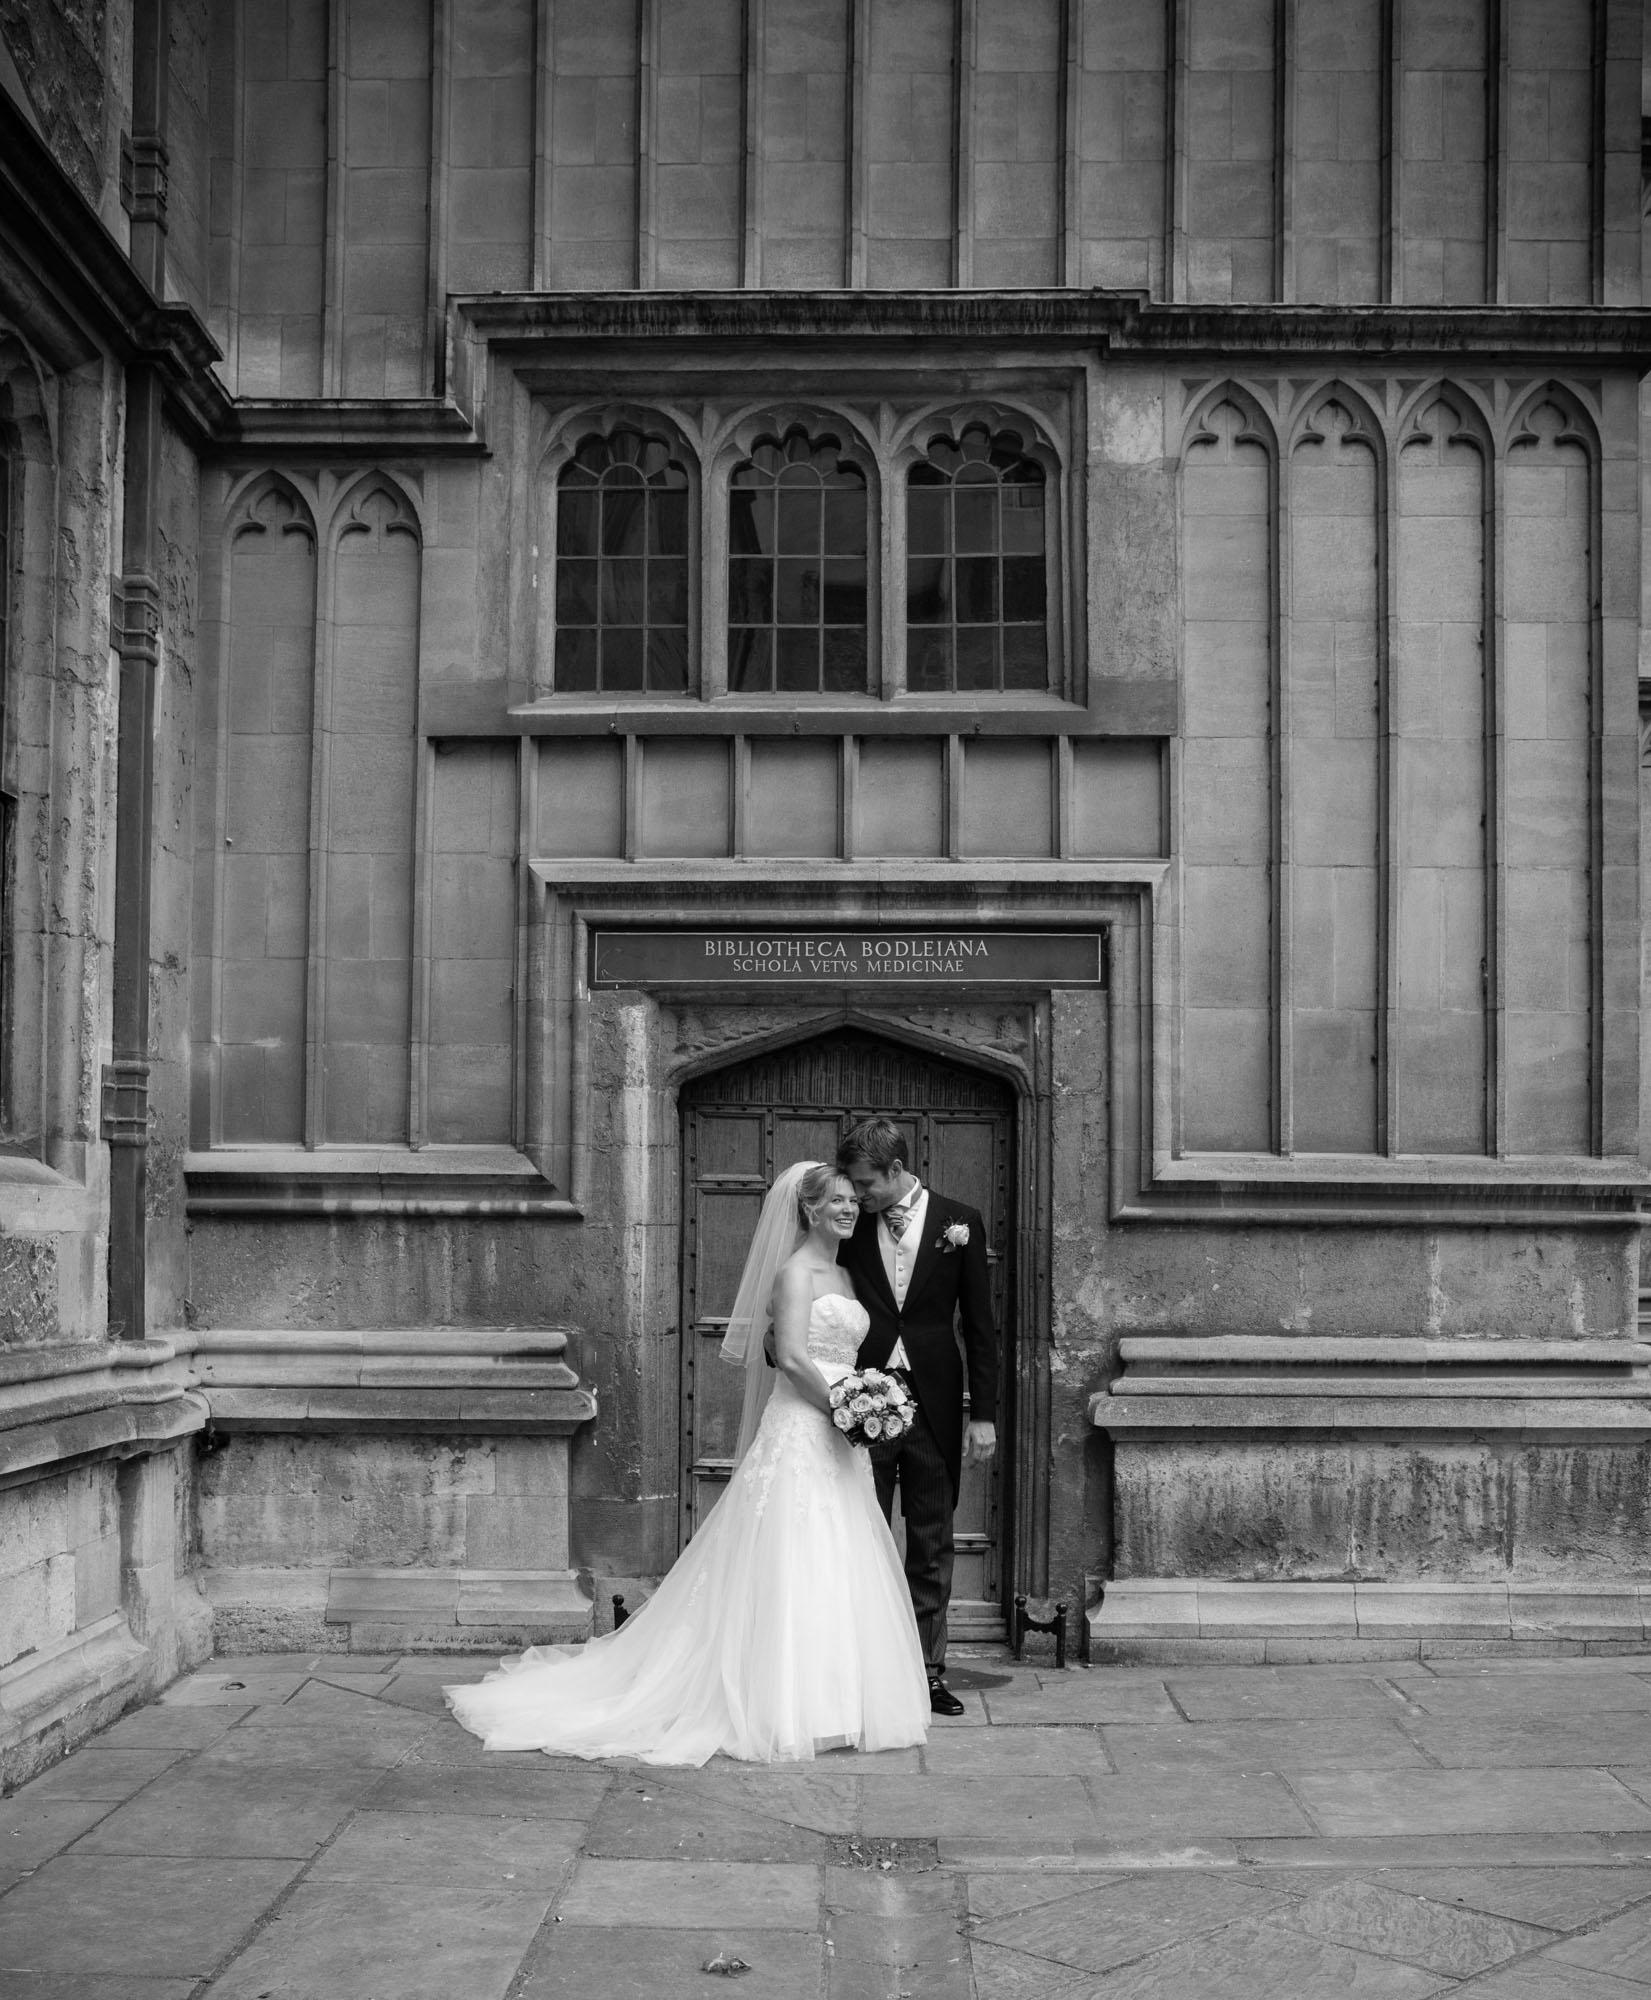 weddings-couples-love-photographer-oxford-london-jonathan-self-photography-75.jpg